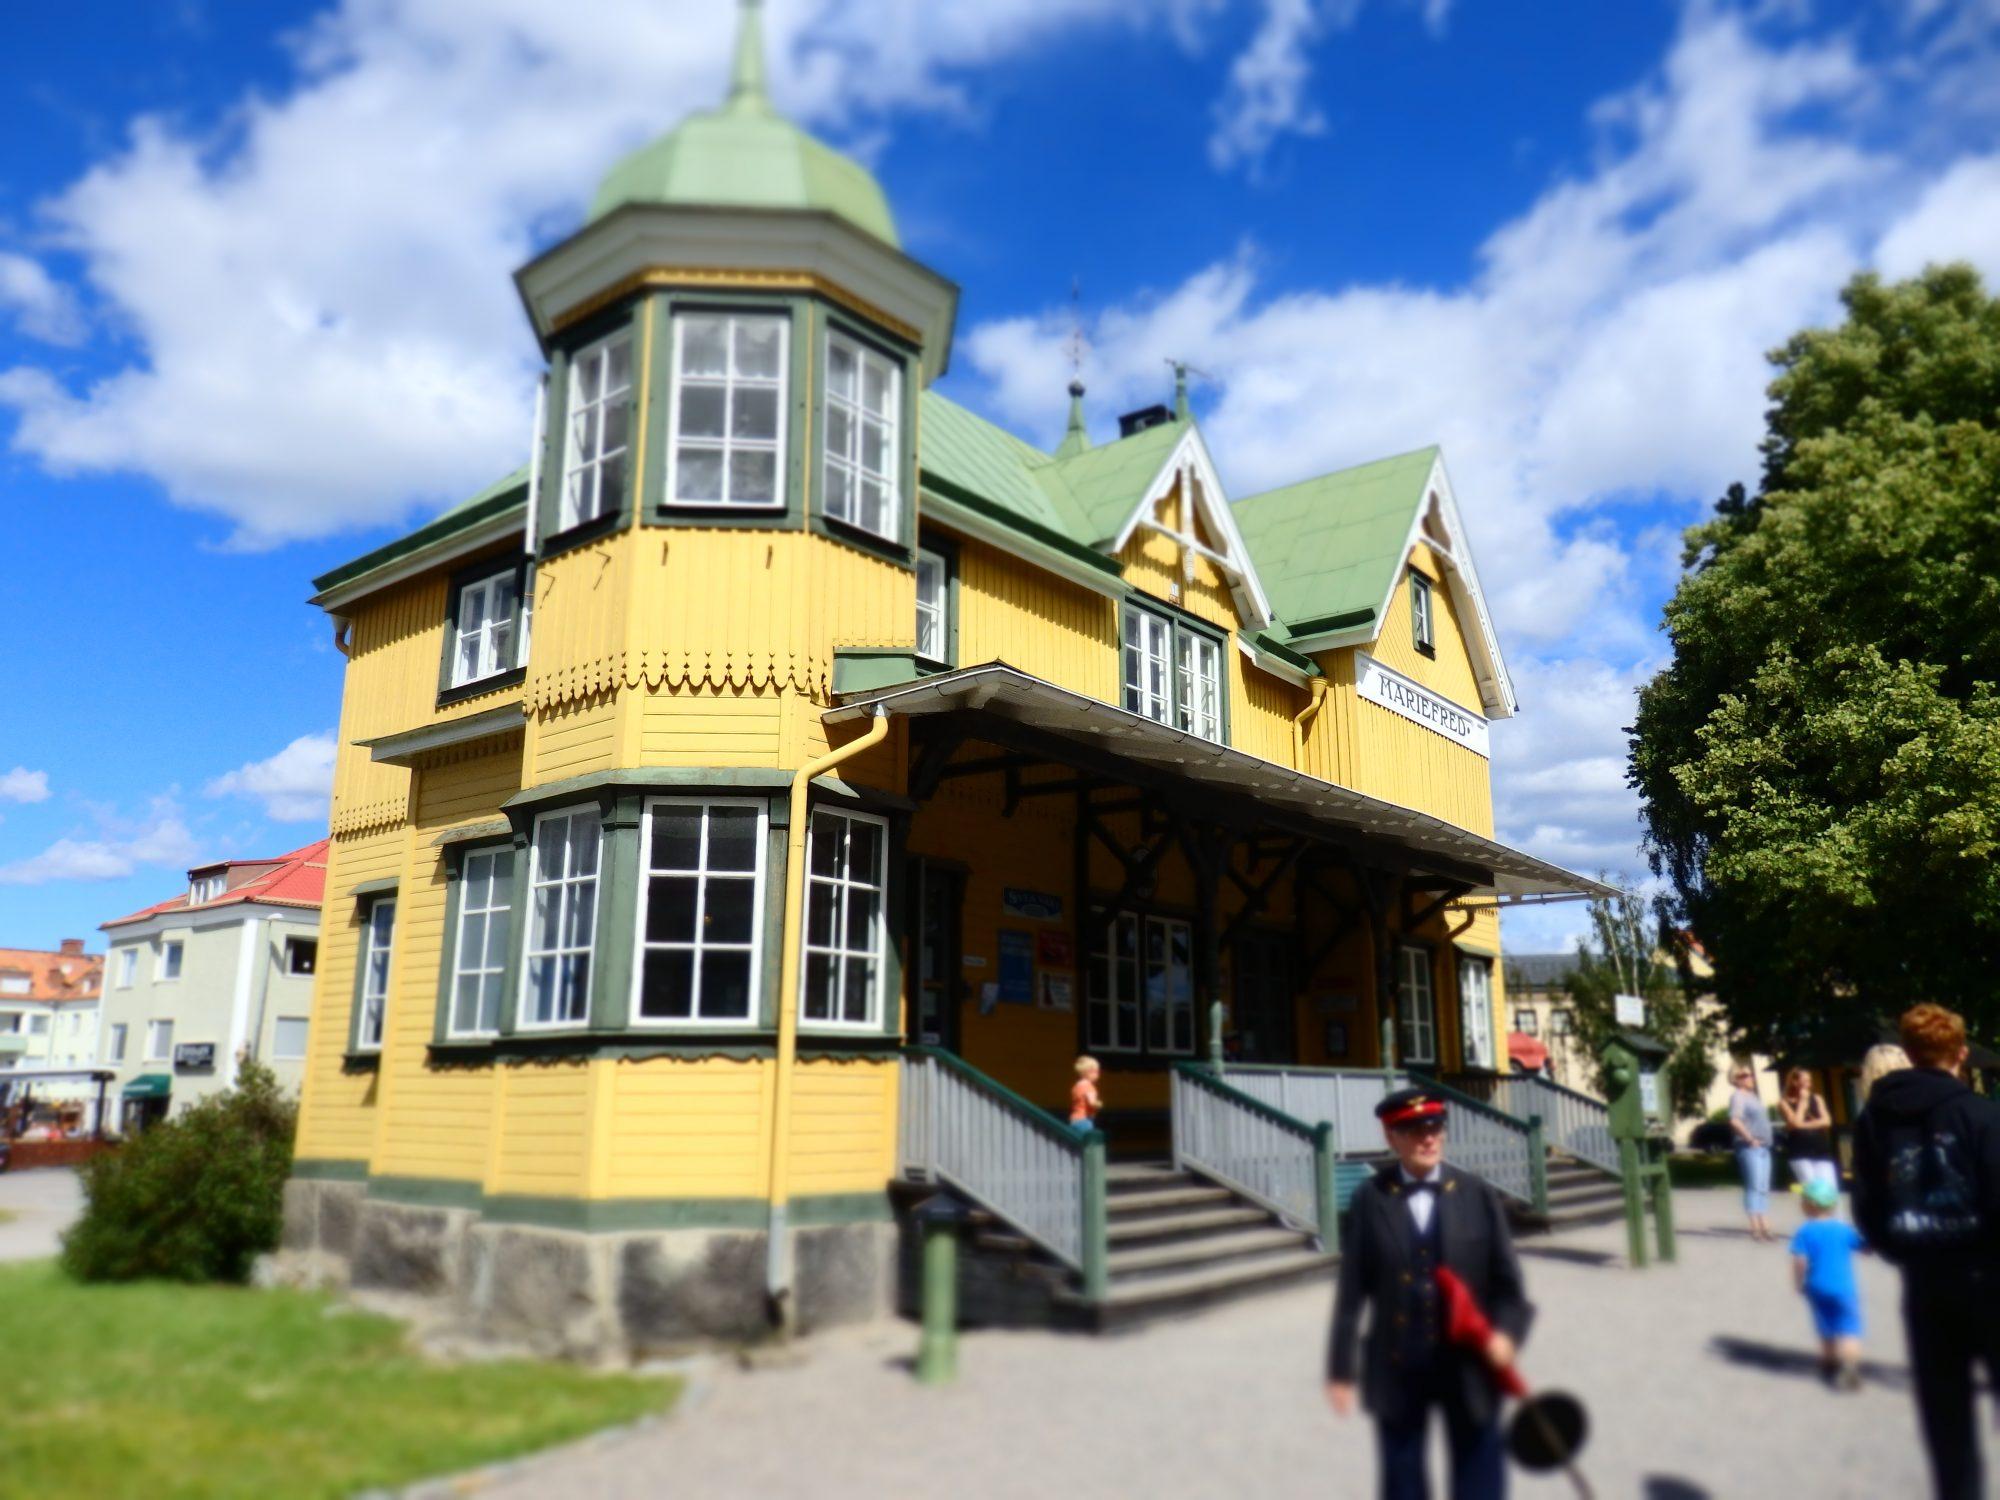 Mariefred steam train station in Sweden